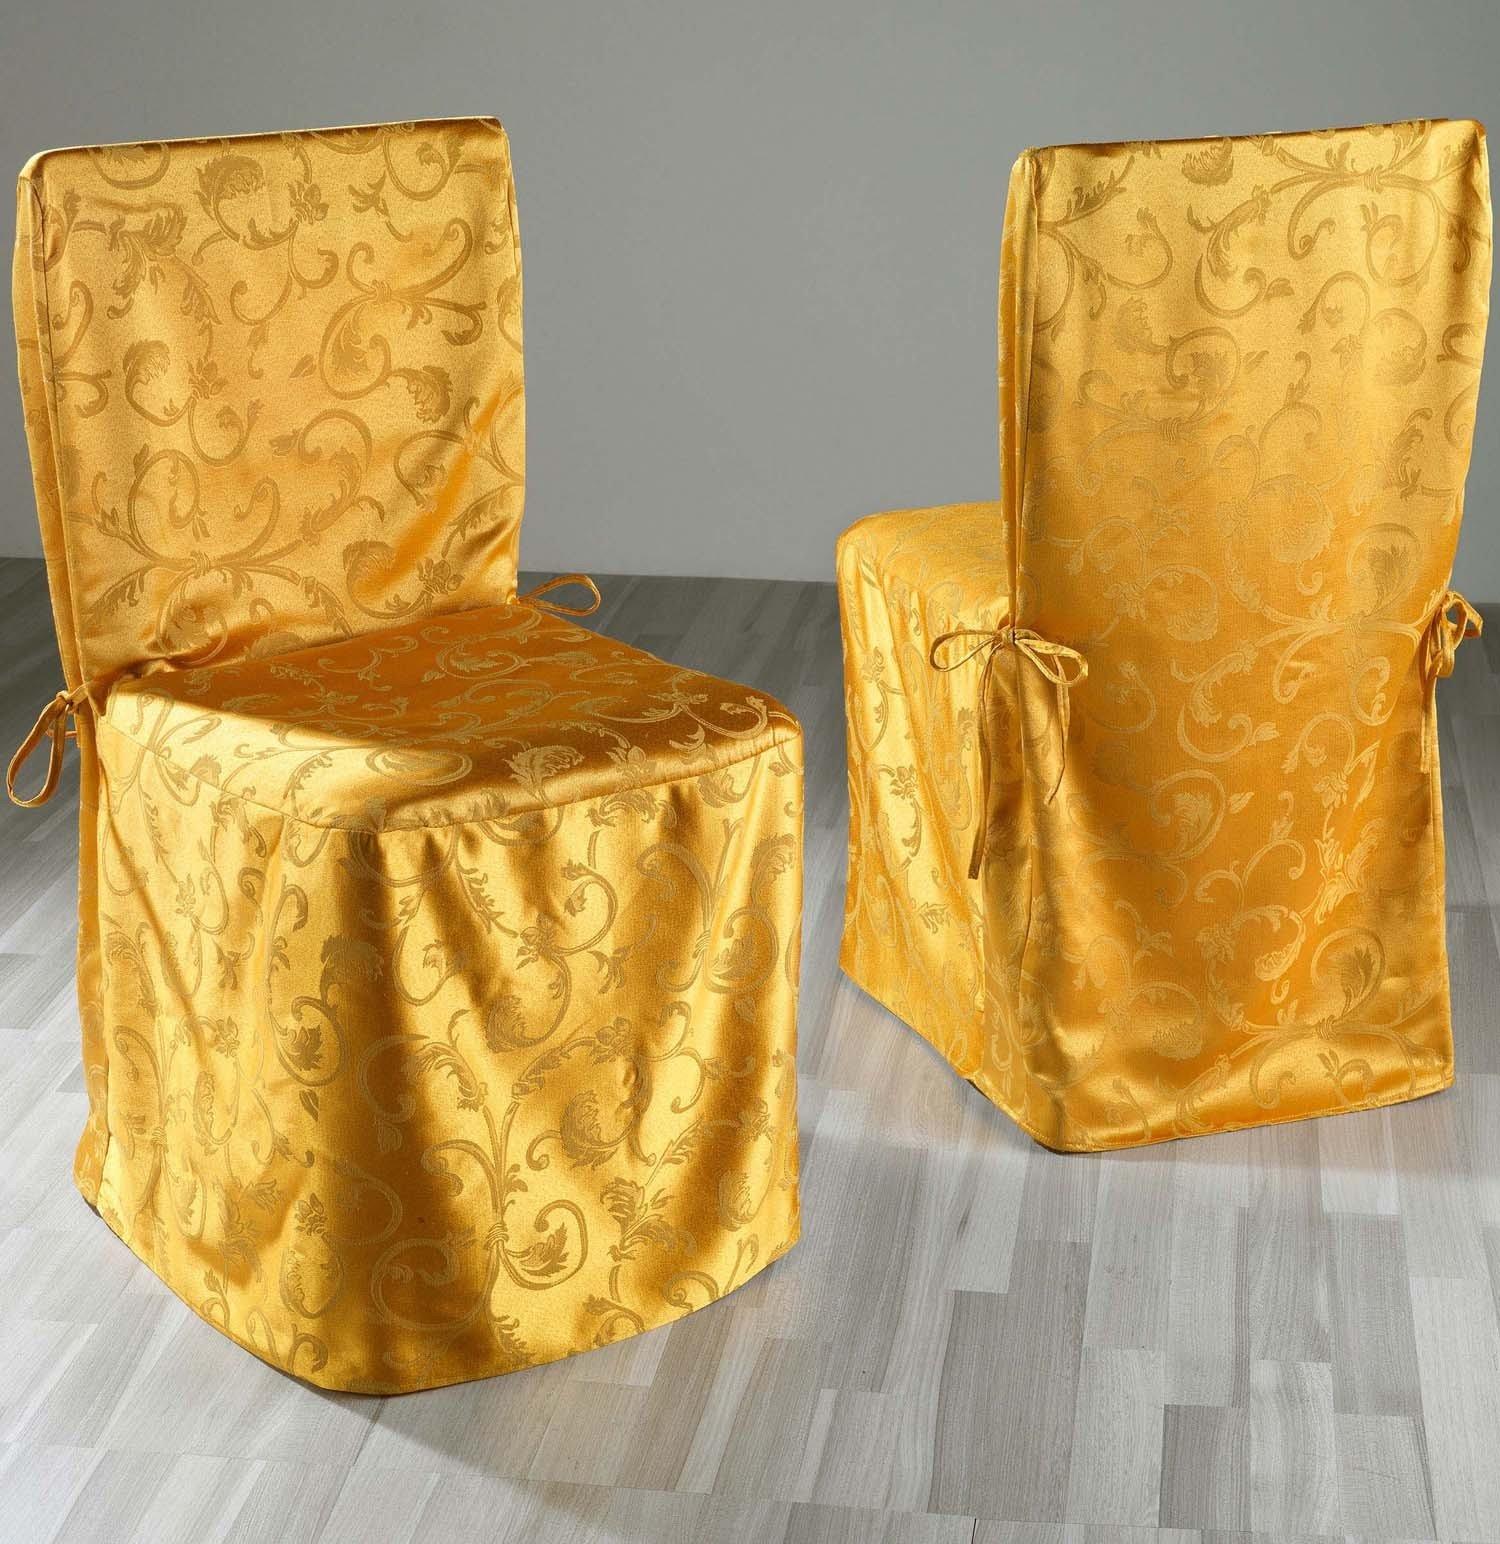 "Stuhl-Überzug""Jacq.""2St.gold"